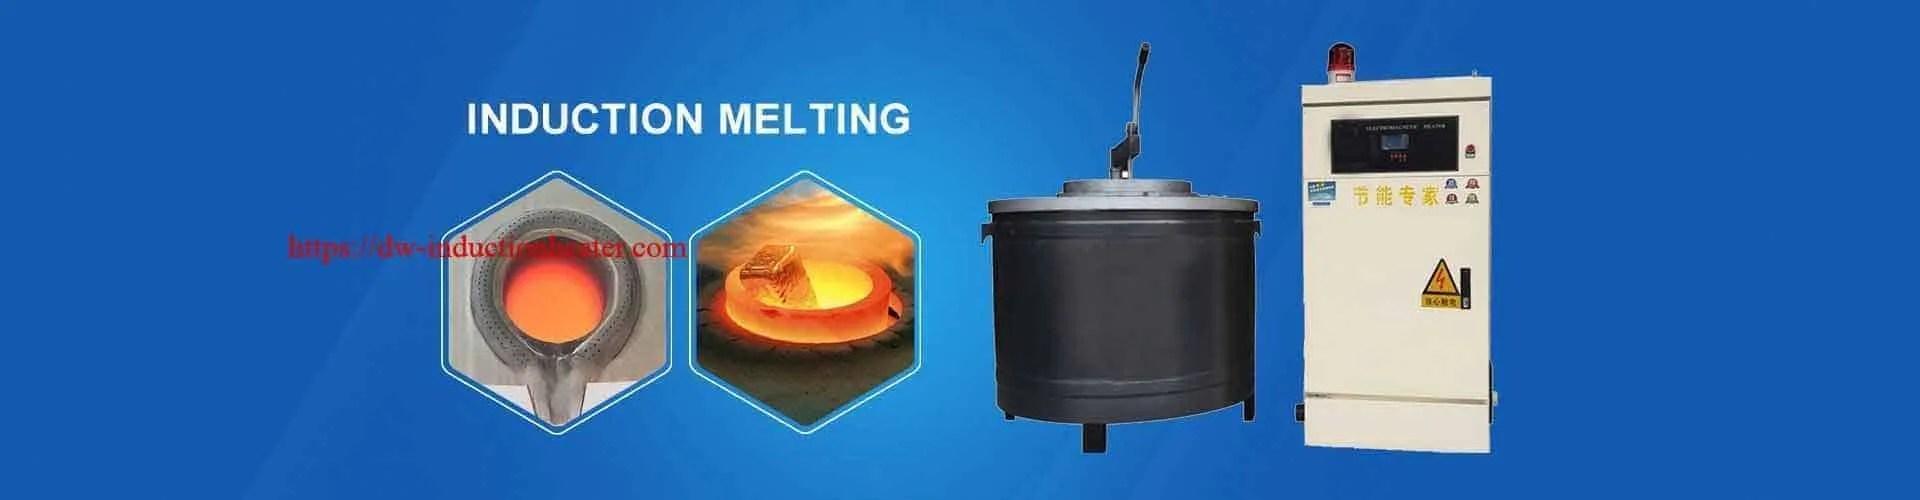 induction-metal-melting-furnace